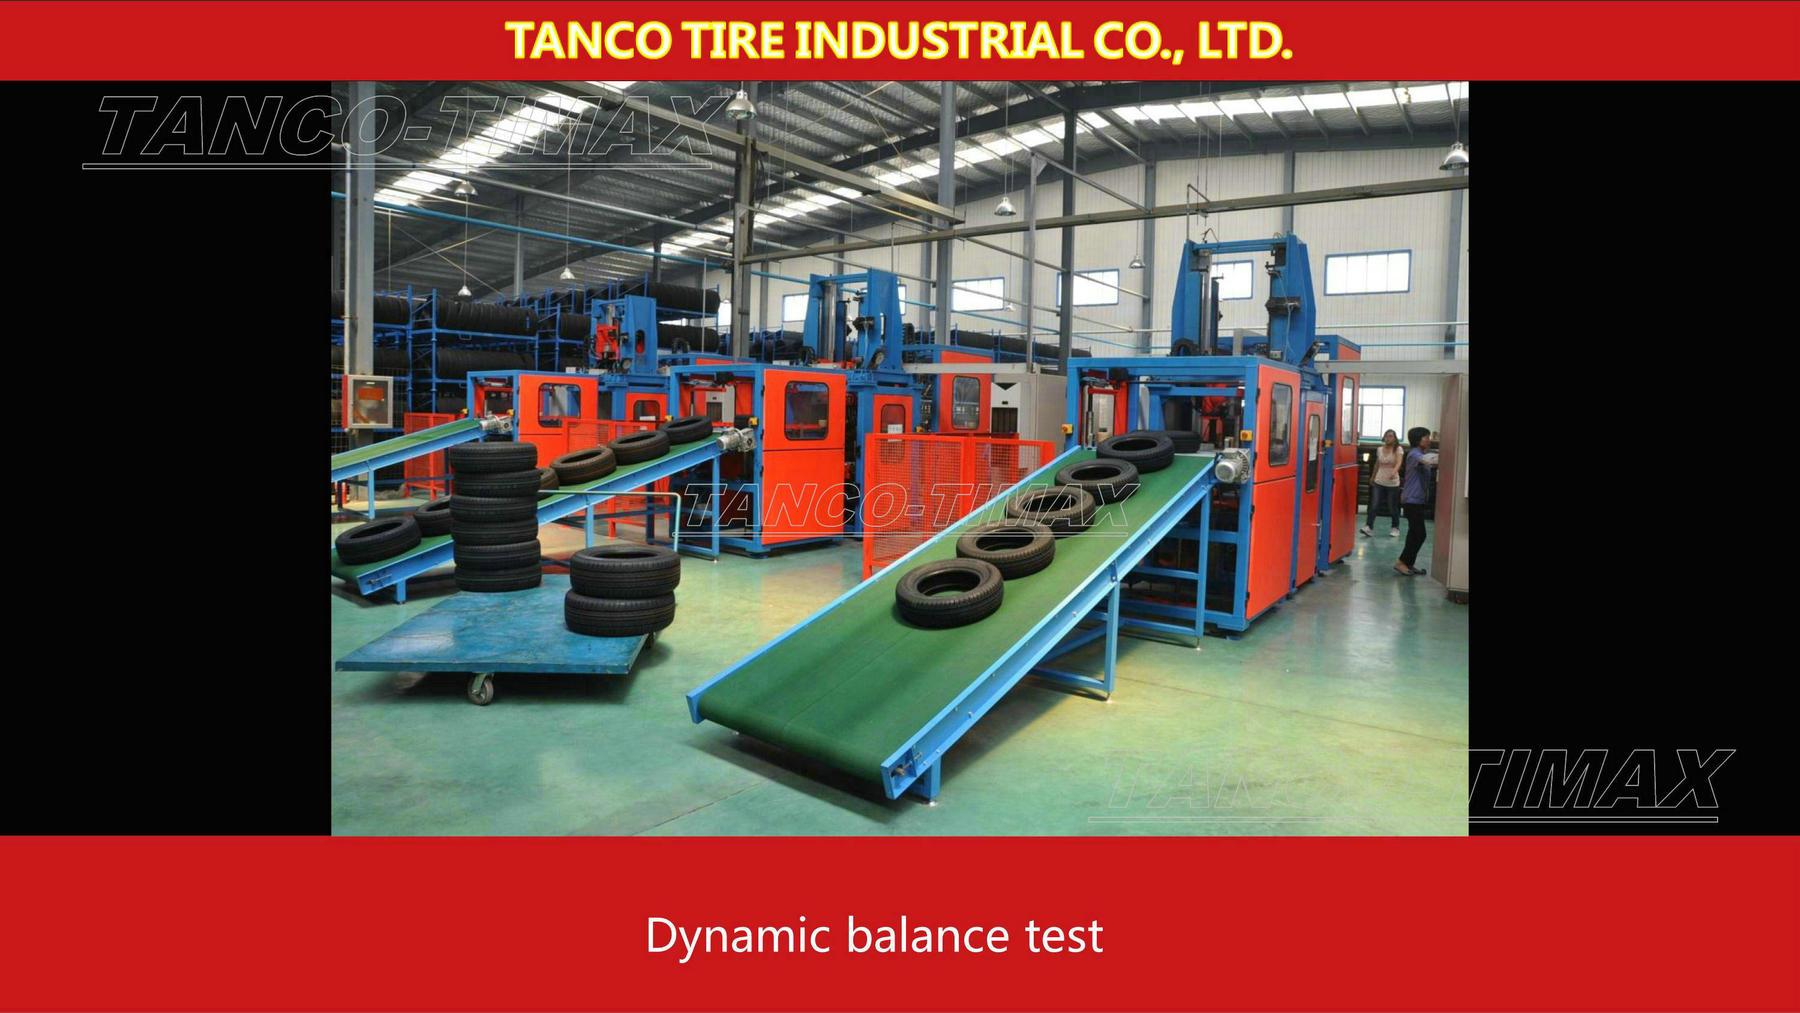 11. Dynamic balance test